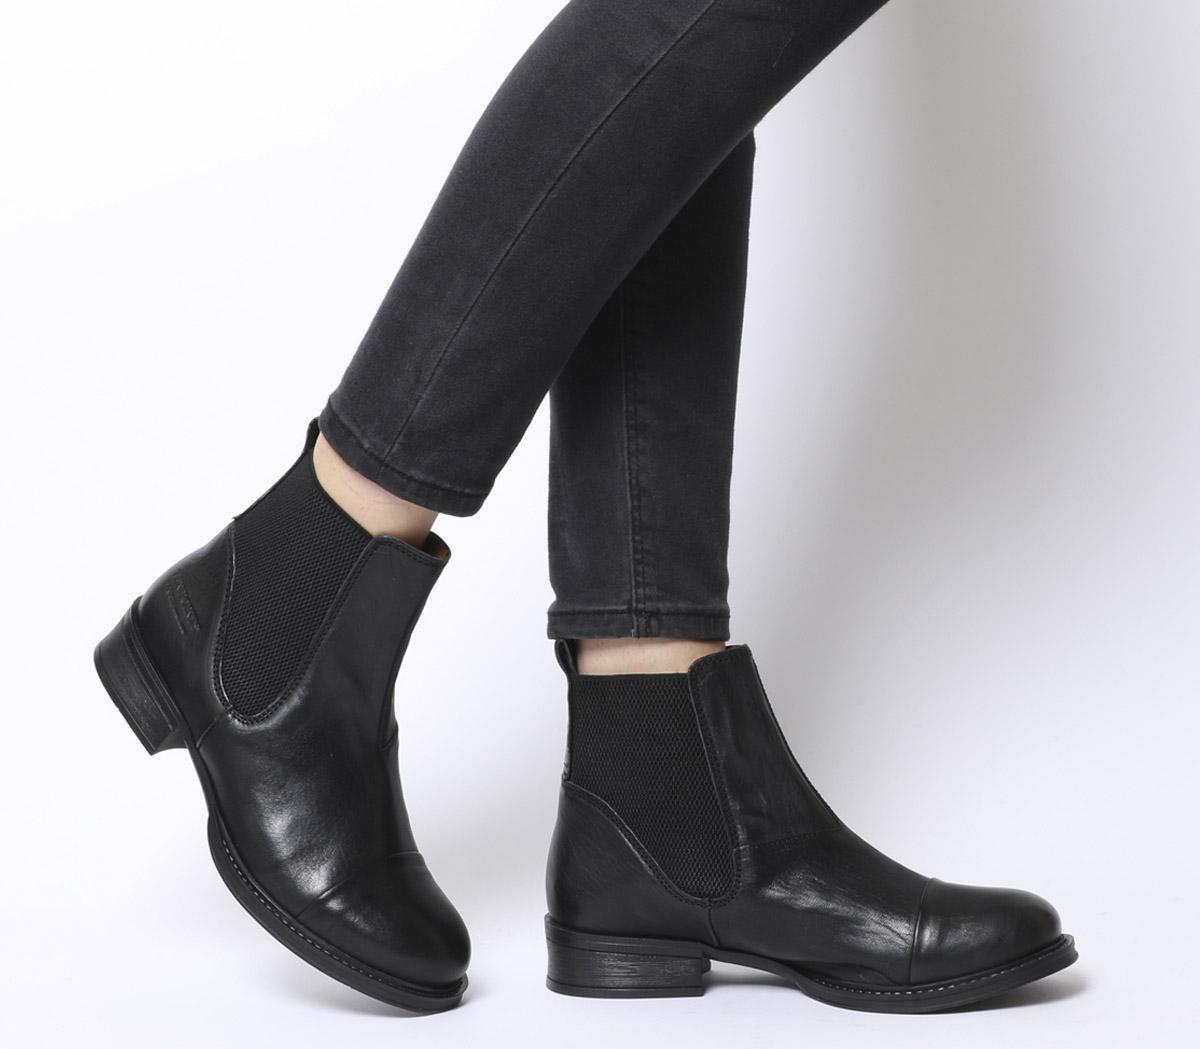 Pandora Chelsea Boots